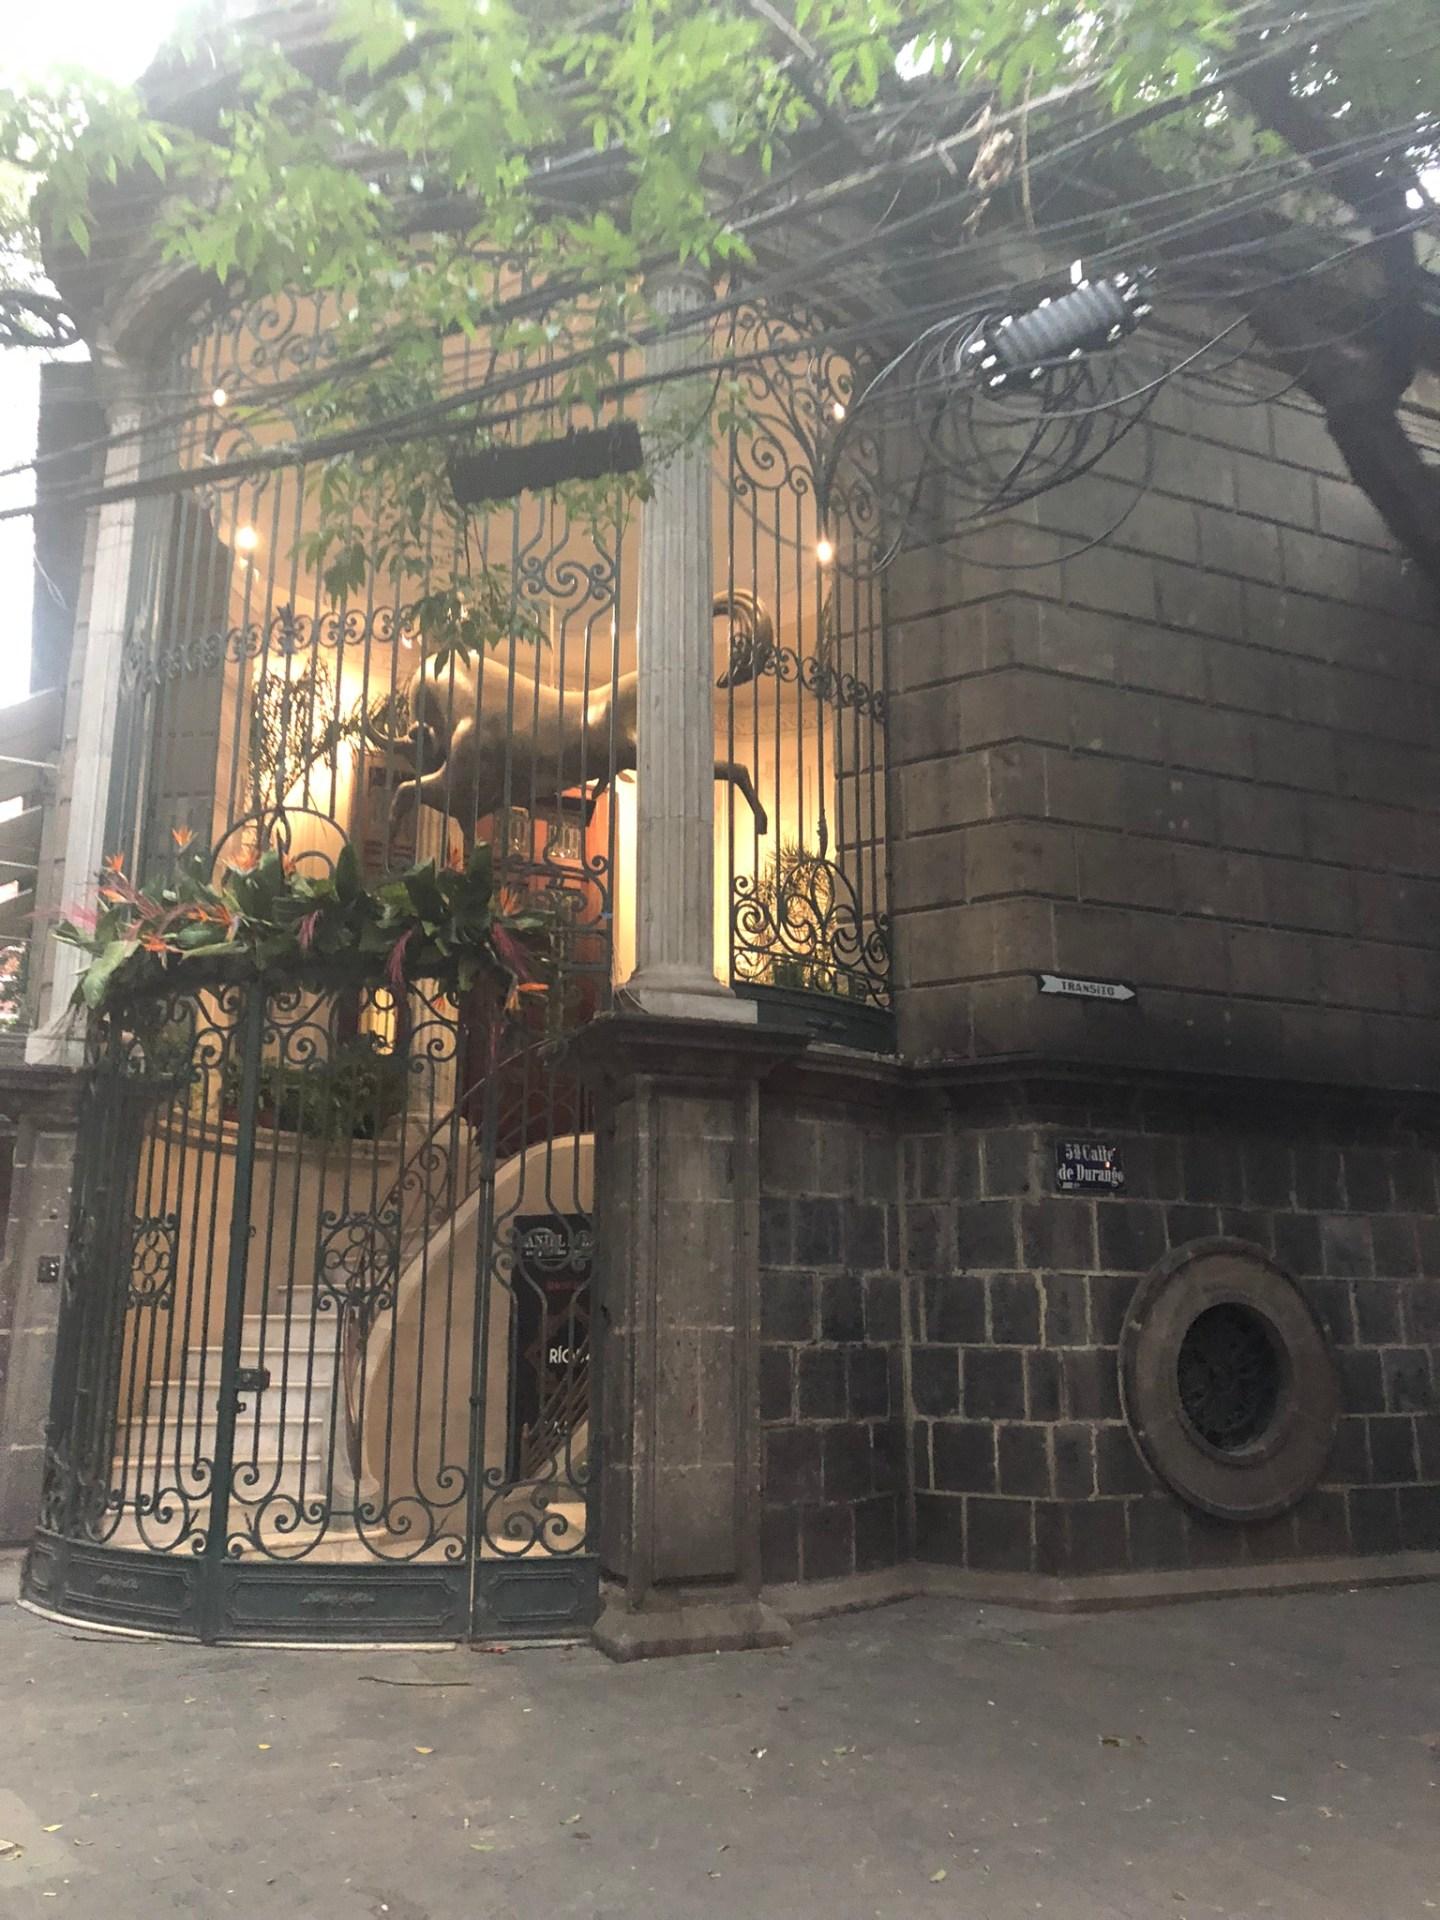 The streets of Roma, Mexico City